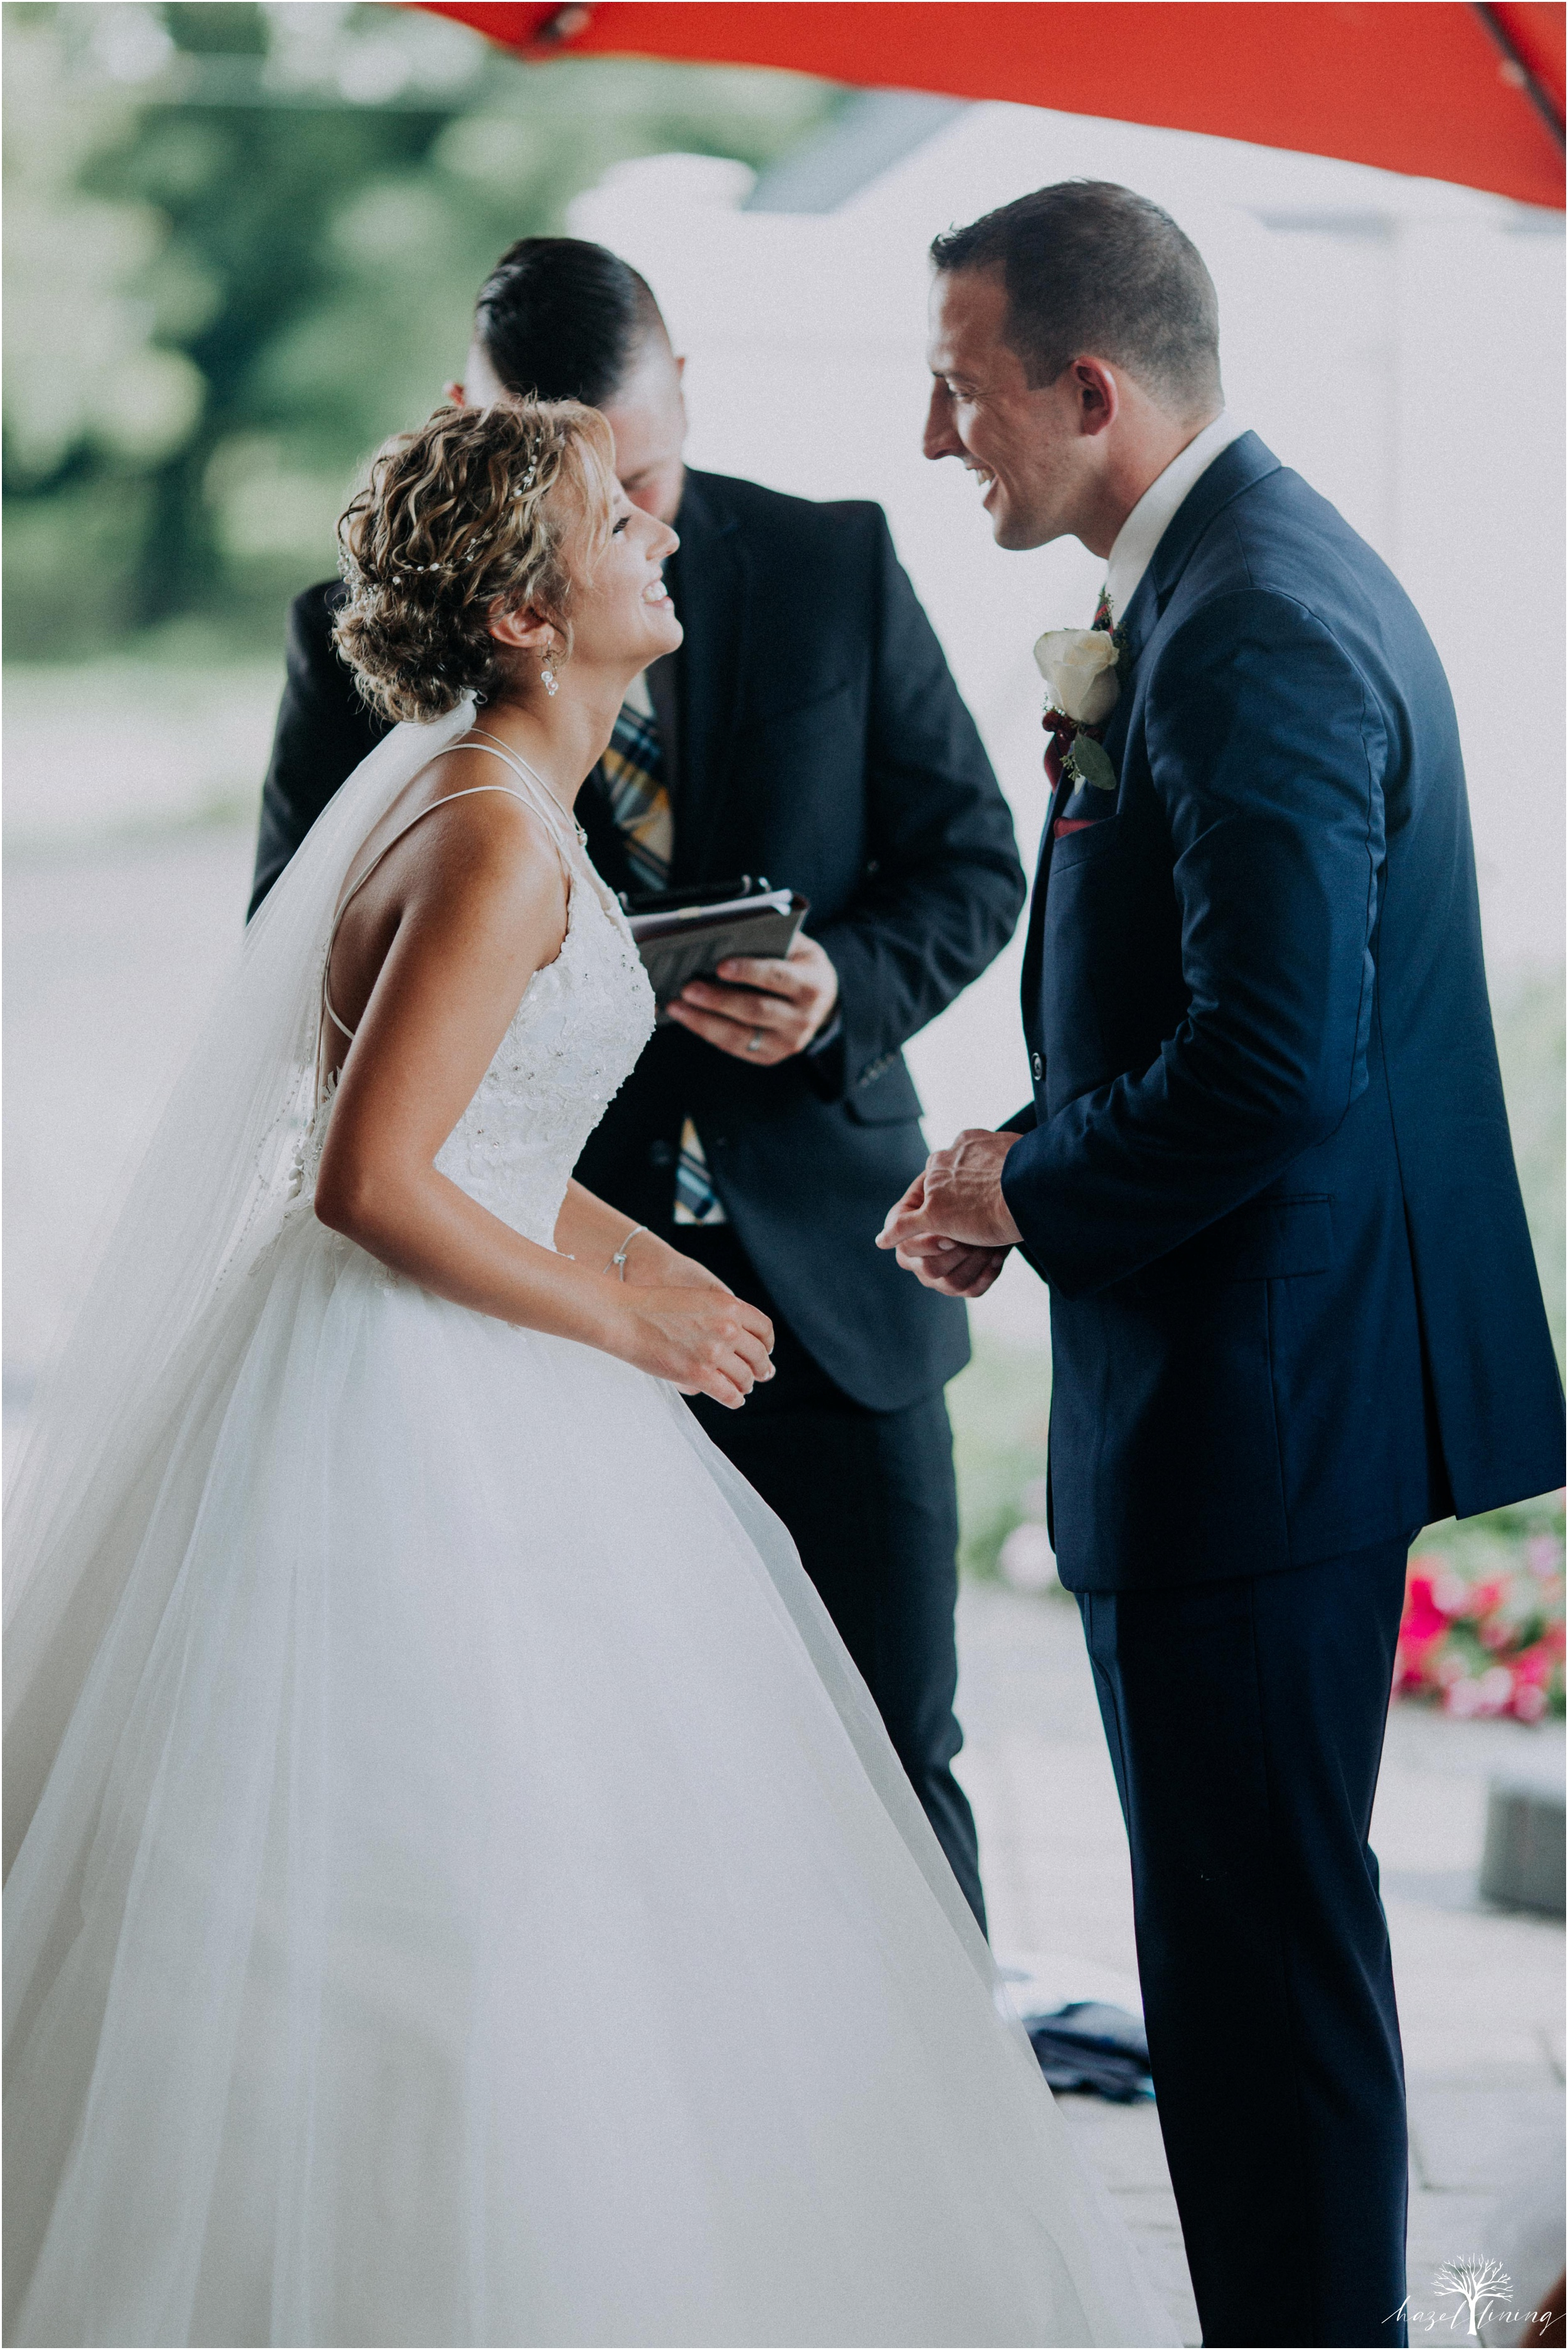 jonathan-weibel-becky-haywood-loft-at-sweetwater-cc-pennsburg-pennsylvania-rainy-day-summer-wedding-hazel-lining-travel-wedding-elopement-photography_0049.jpg